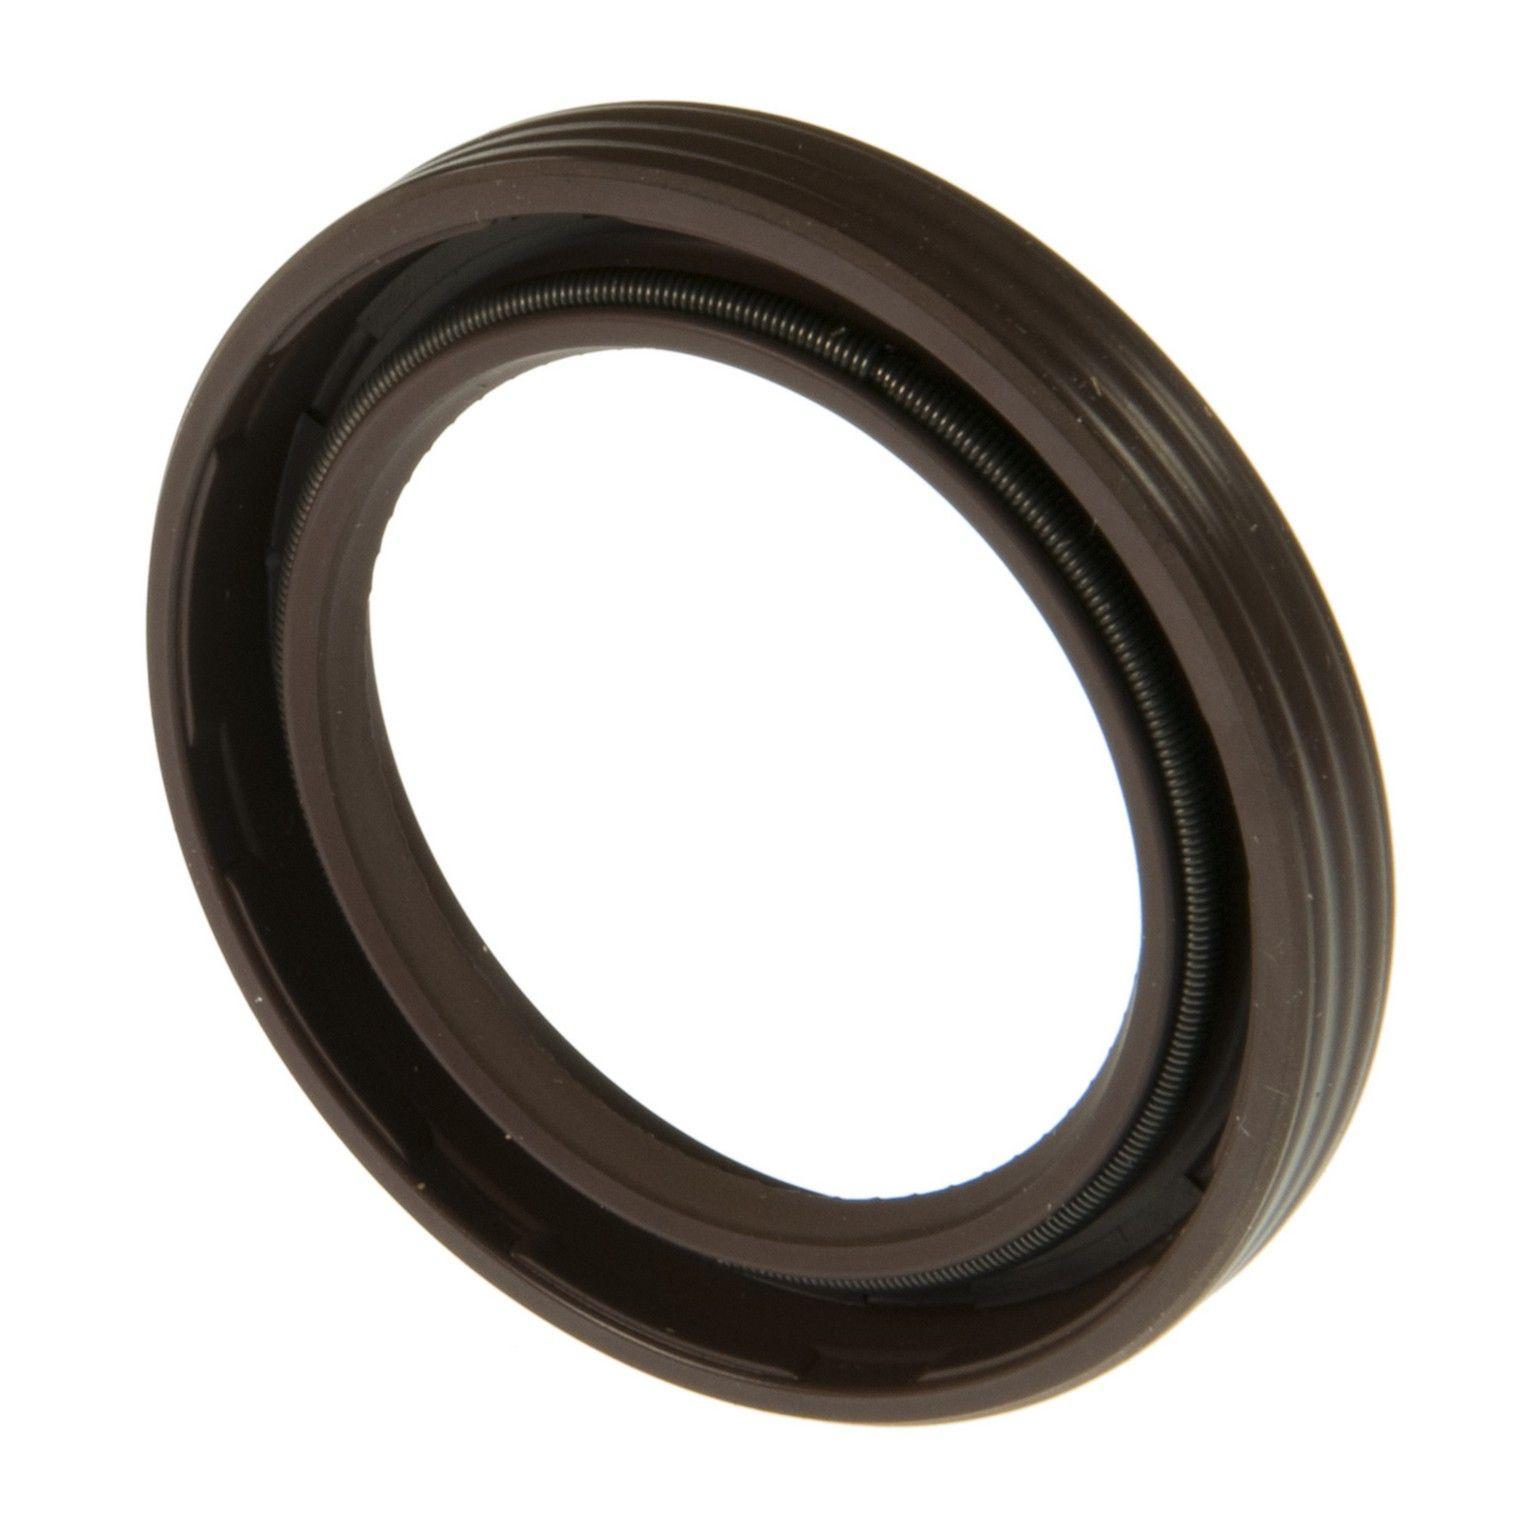 Ford Escape Engine Crankshaft Seal Replacement (Genuine